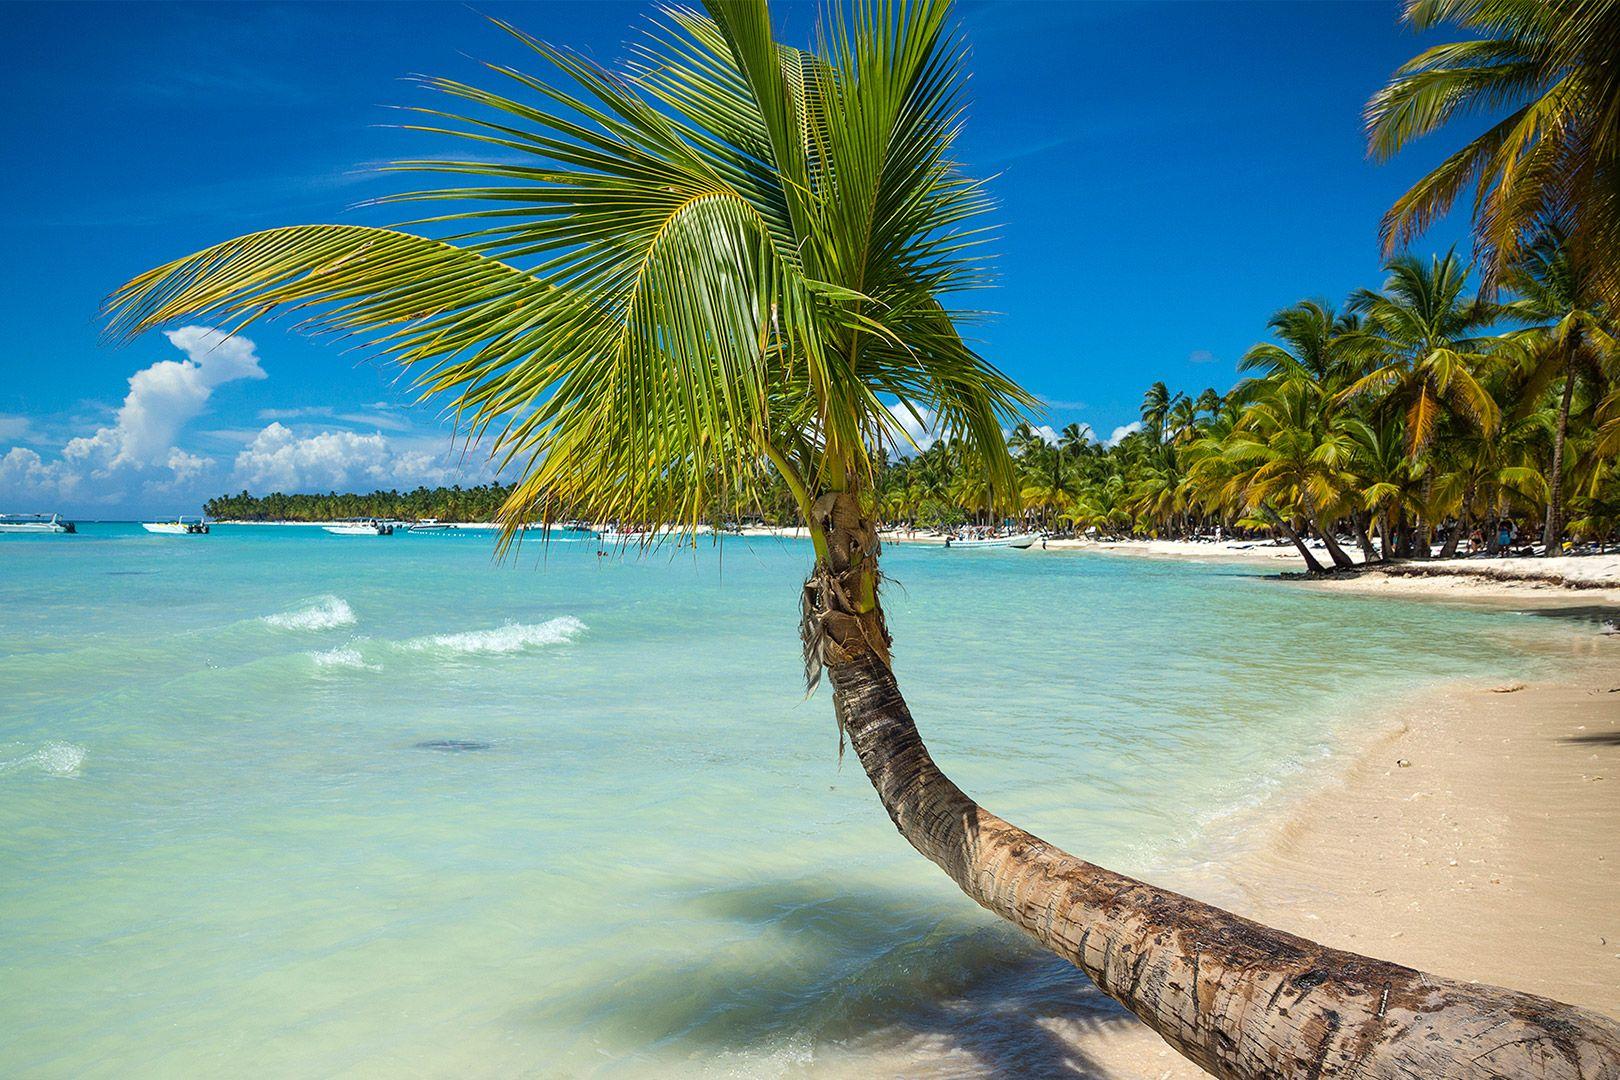 Sejur plaja Secrets Resorts & Spas Punta Cana, 9 zile - 22 august 2021